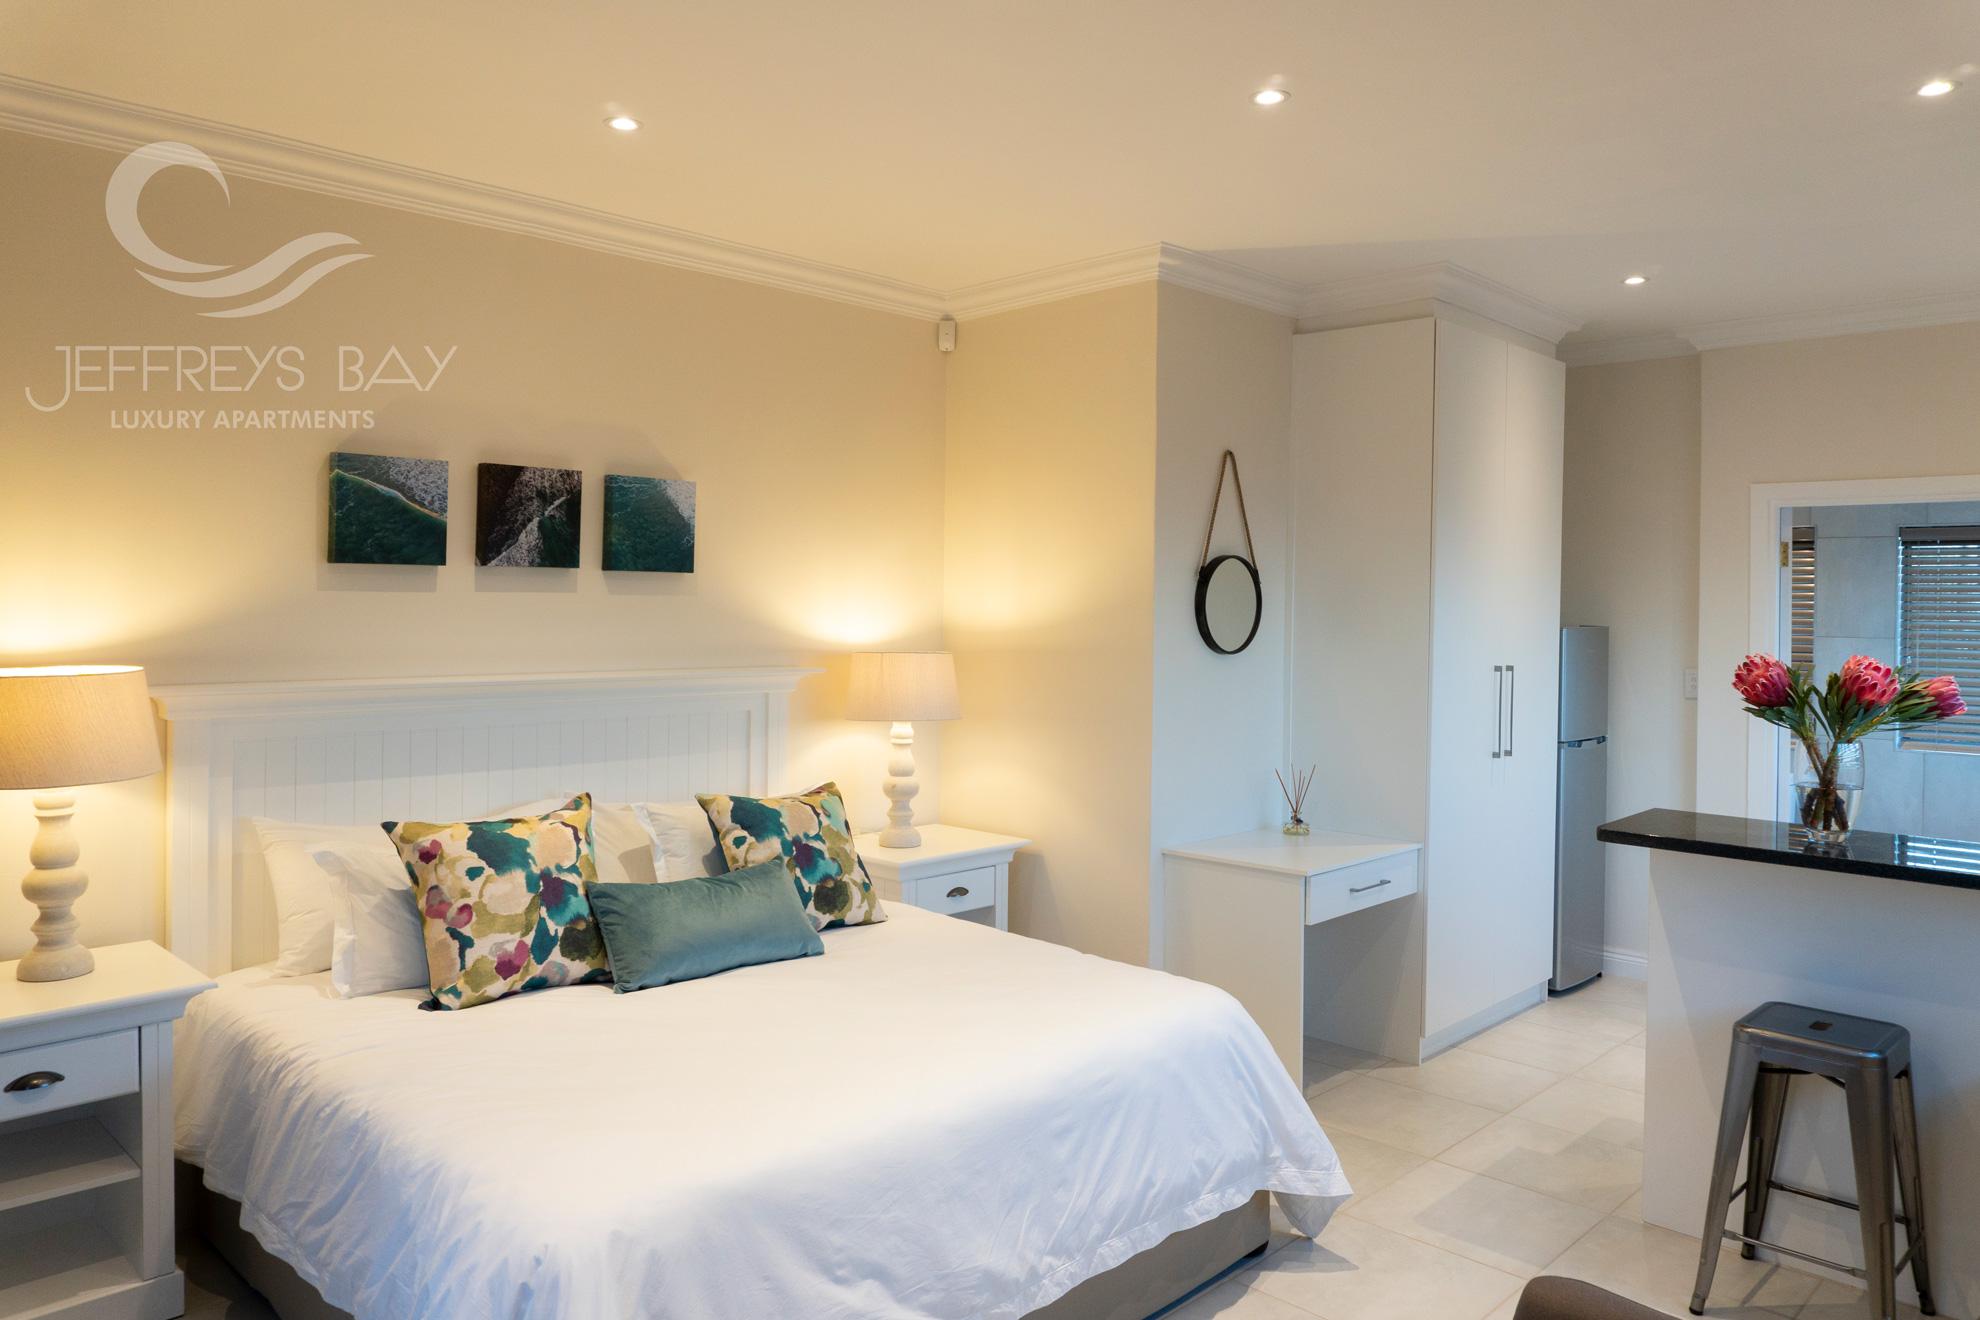 Jeffreysbay_Lux_apartments_Unit8_view